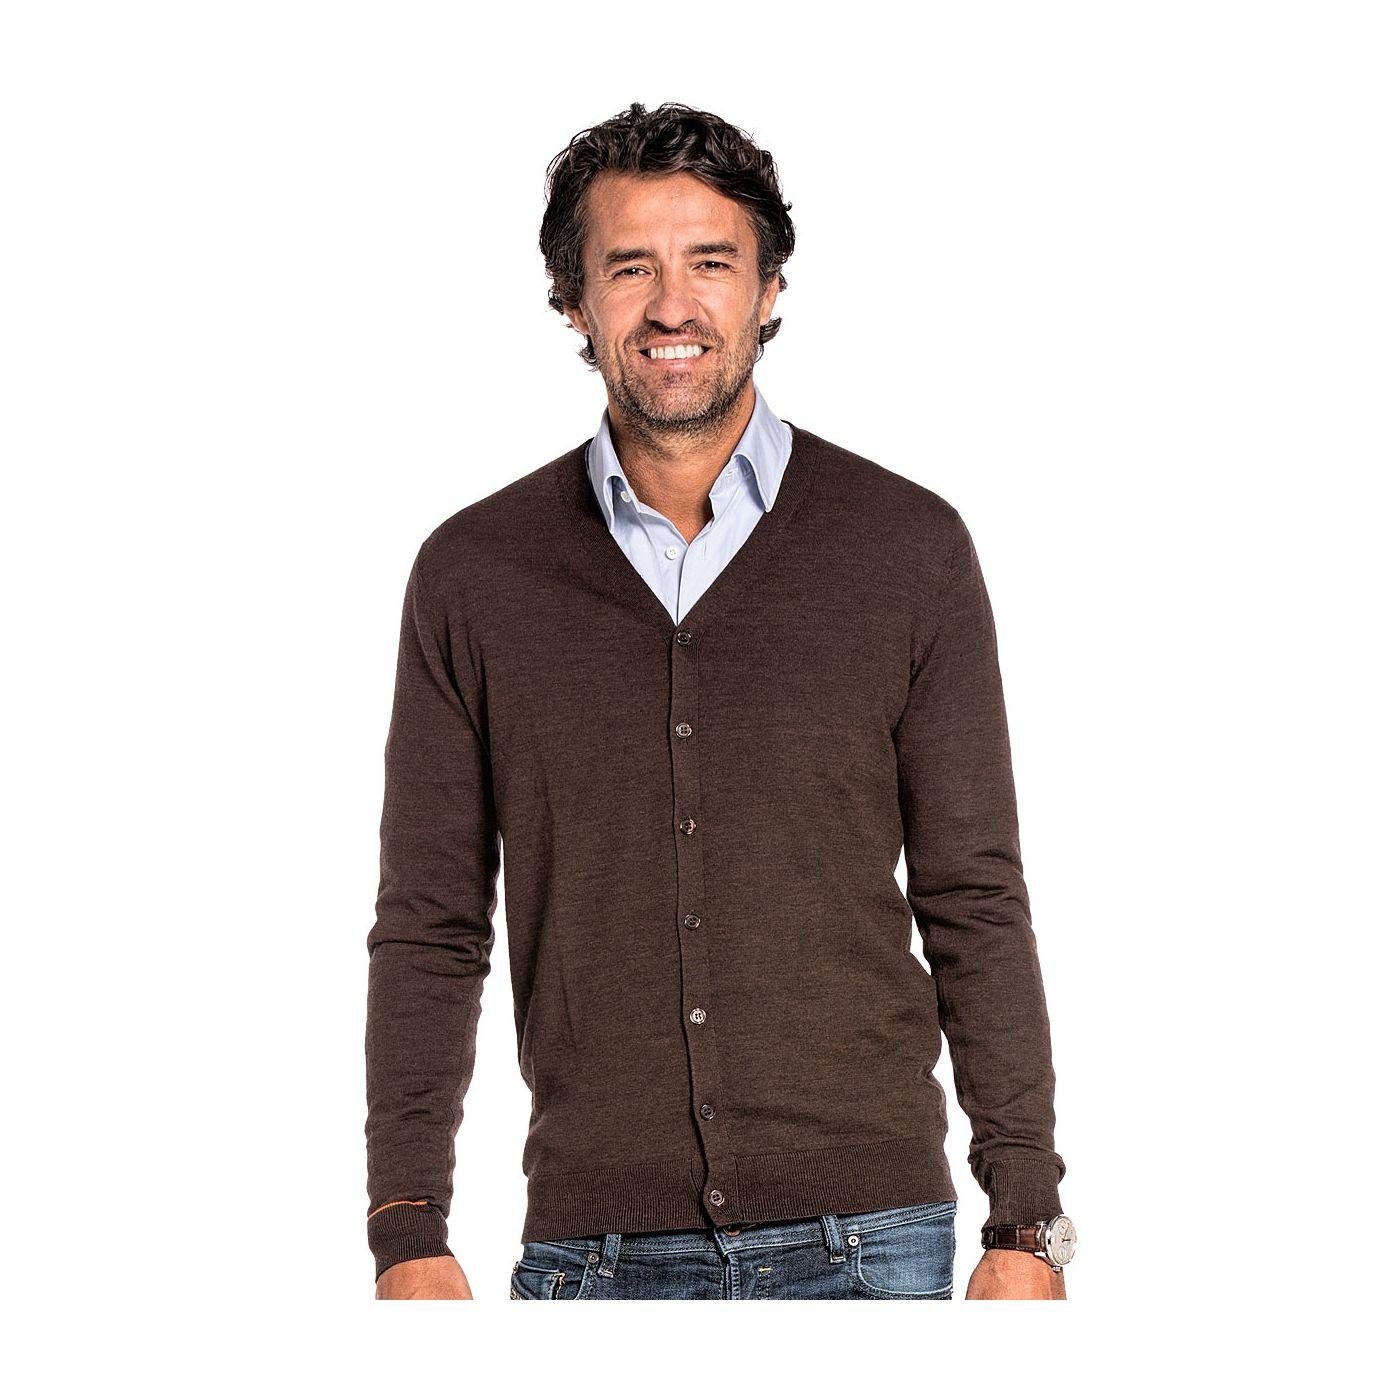 Cardigan for men made of Merino wool in Brown